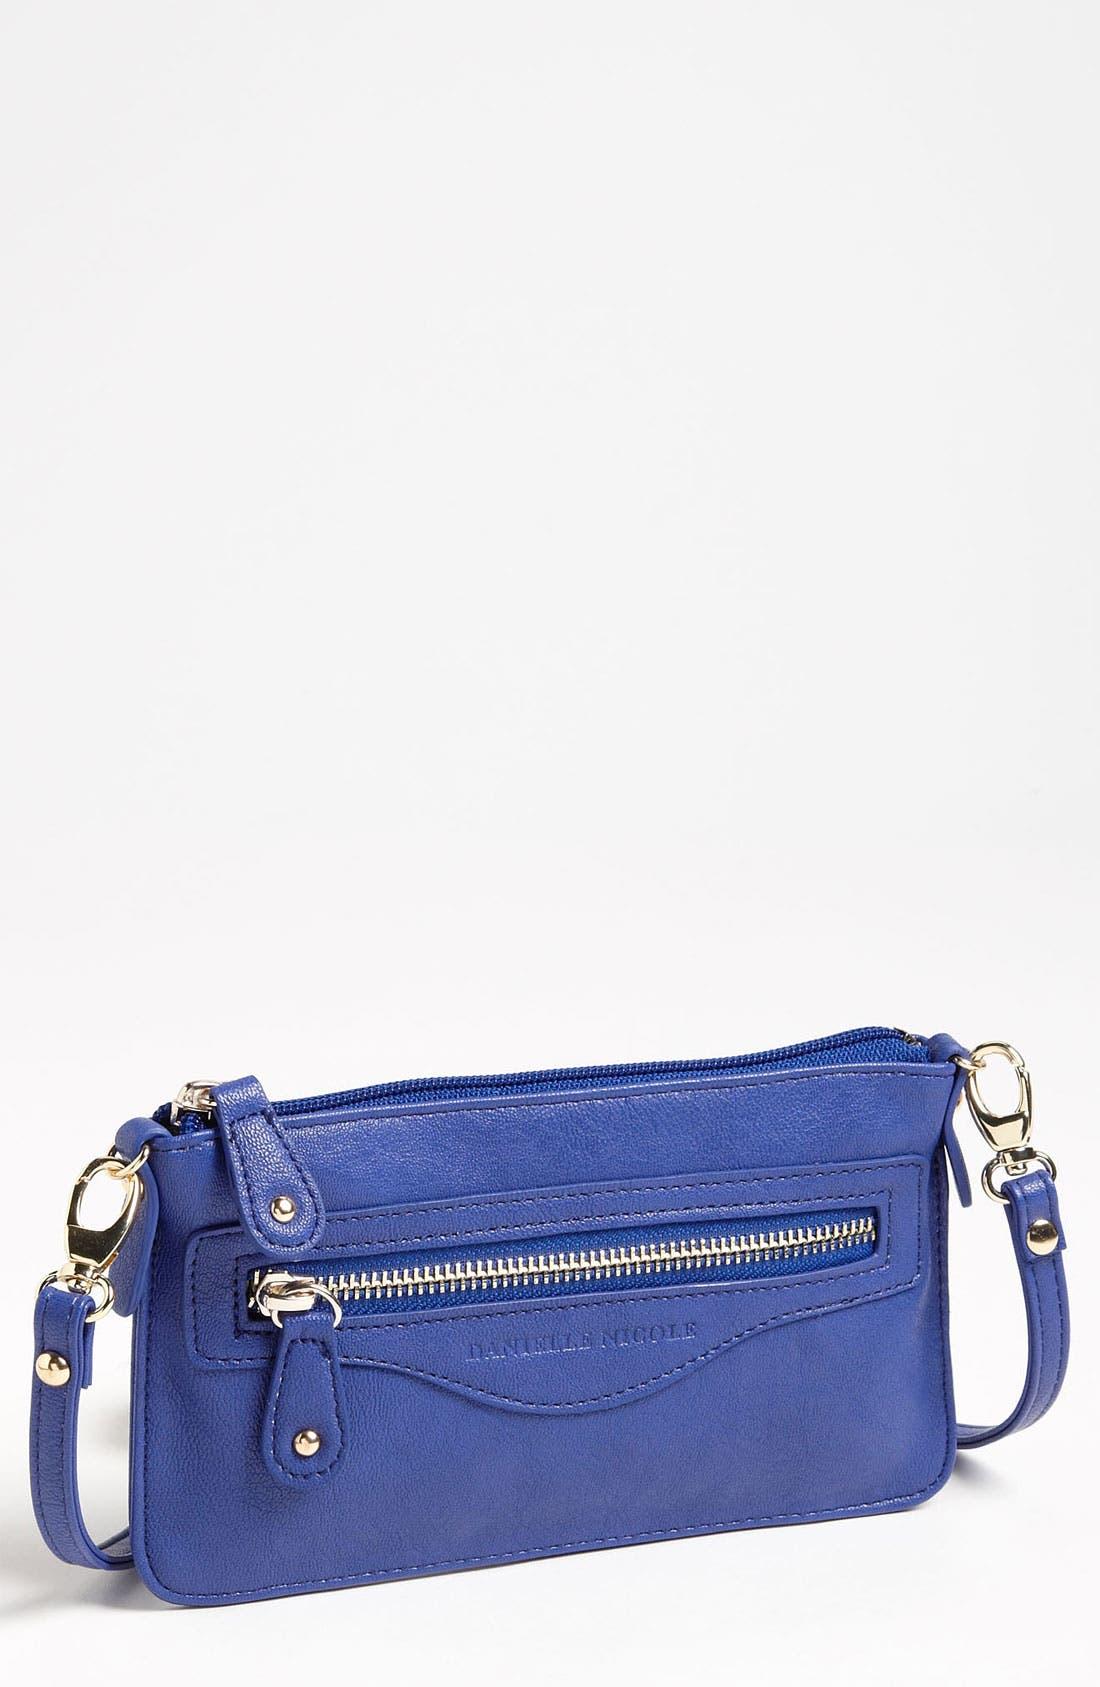 Alternate Image 1 Selected - Danielle Nicole 'Davina' Crossbody Bag